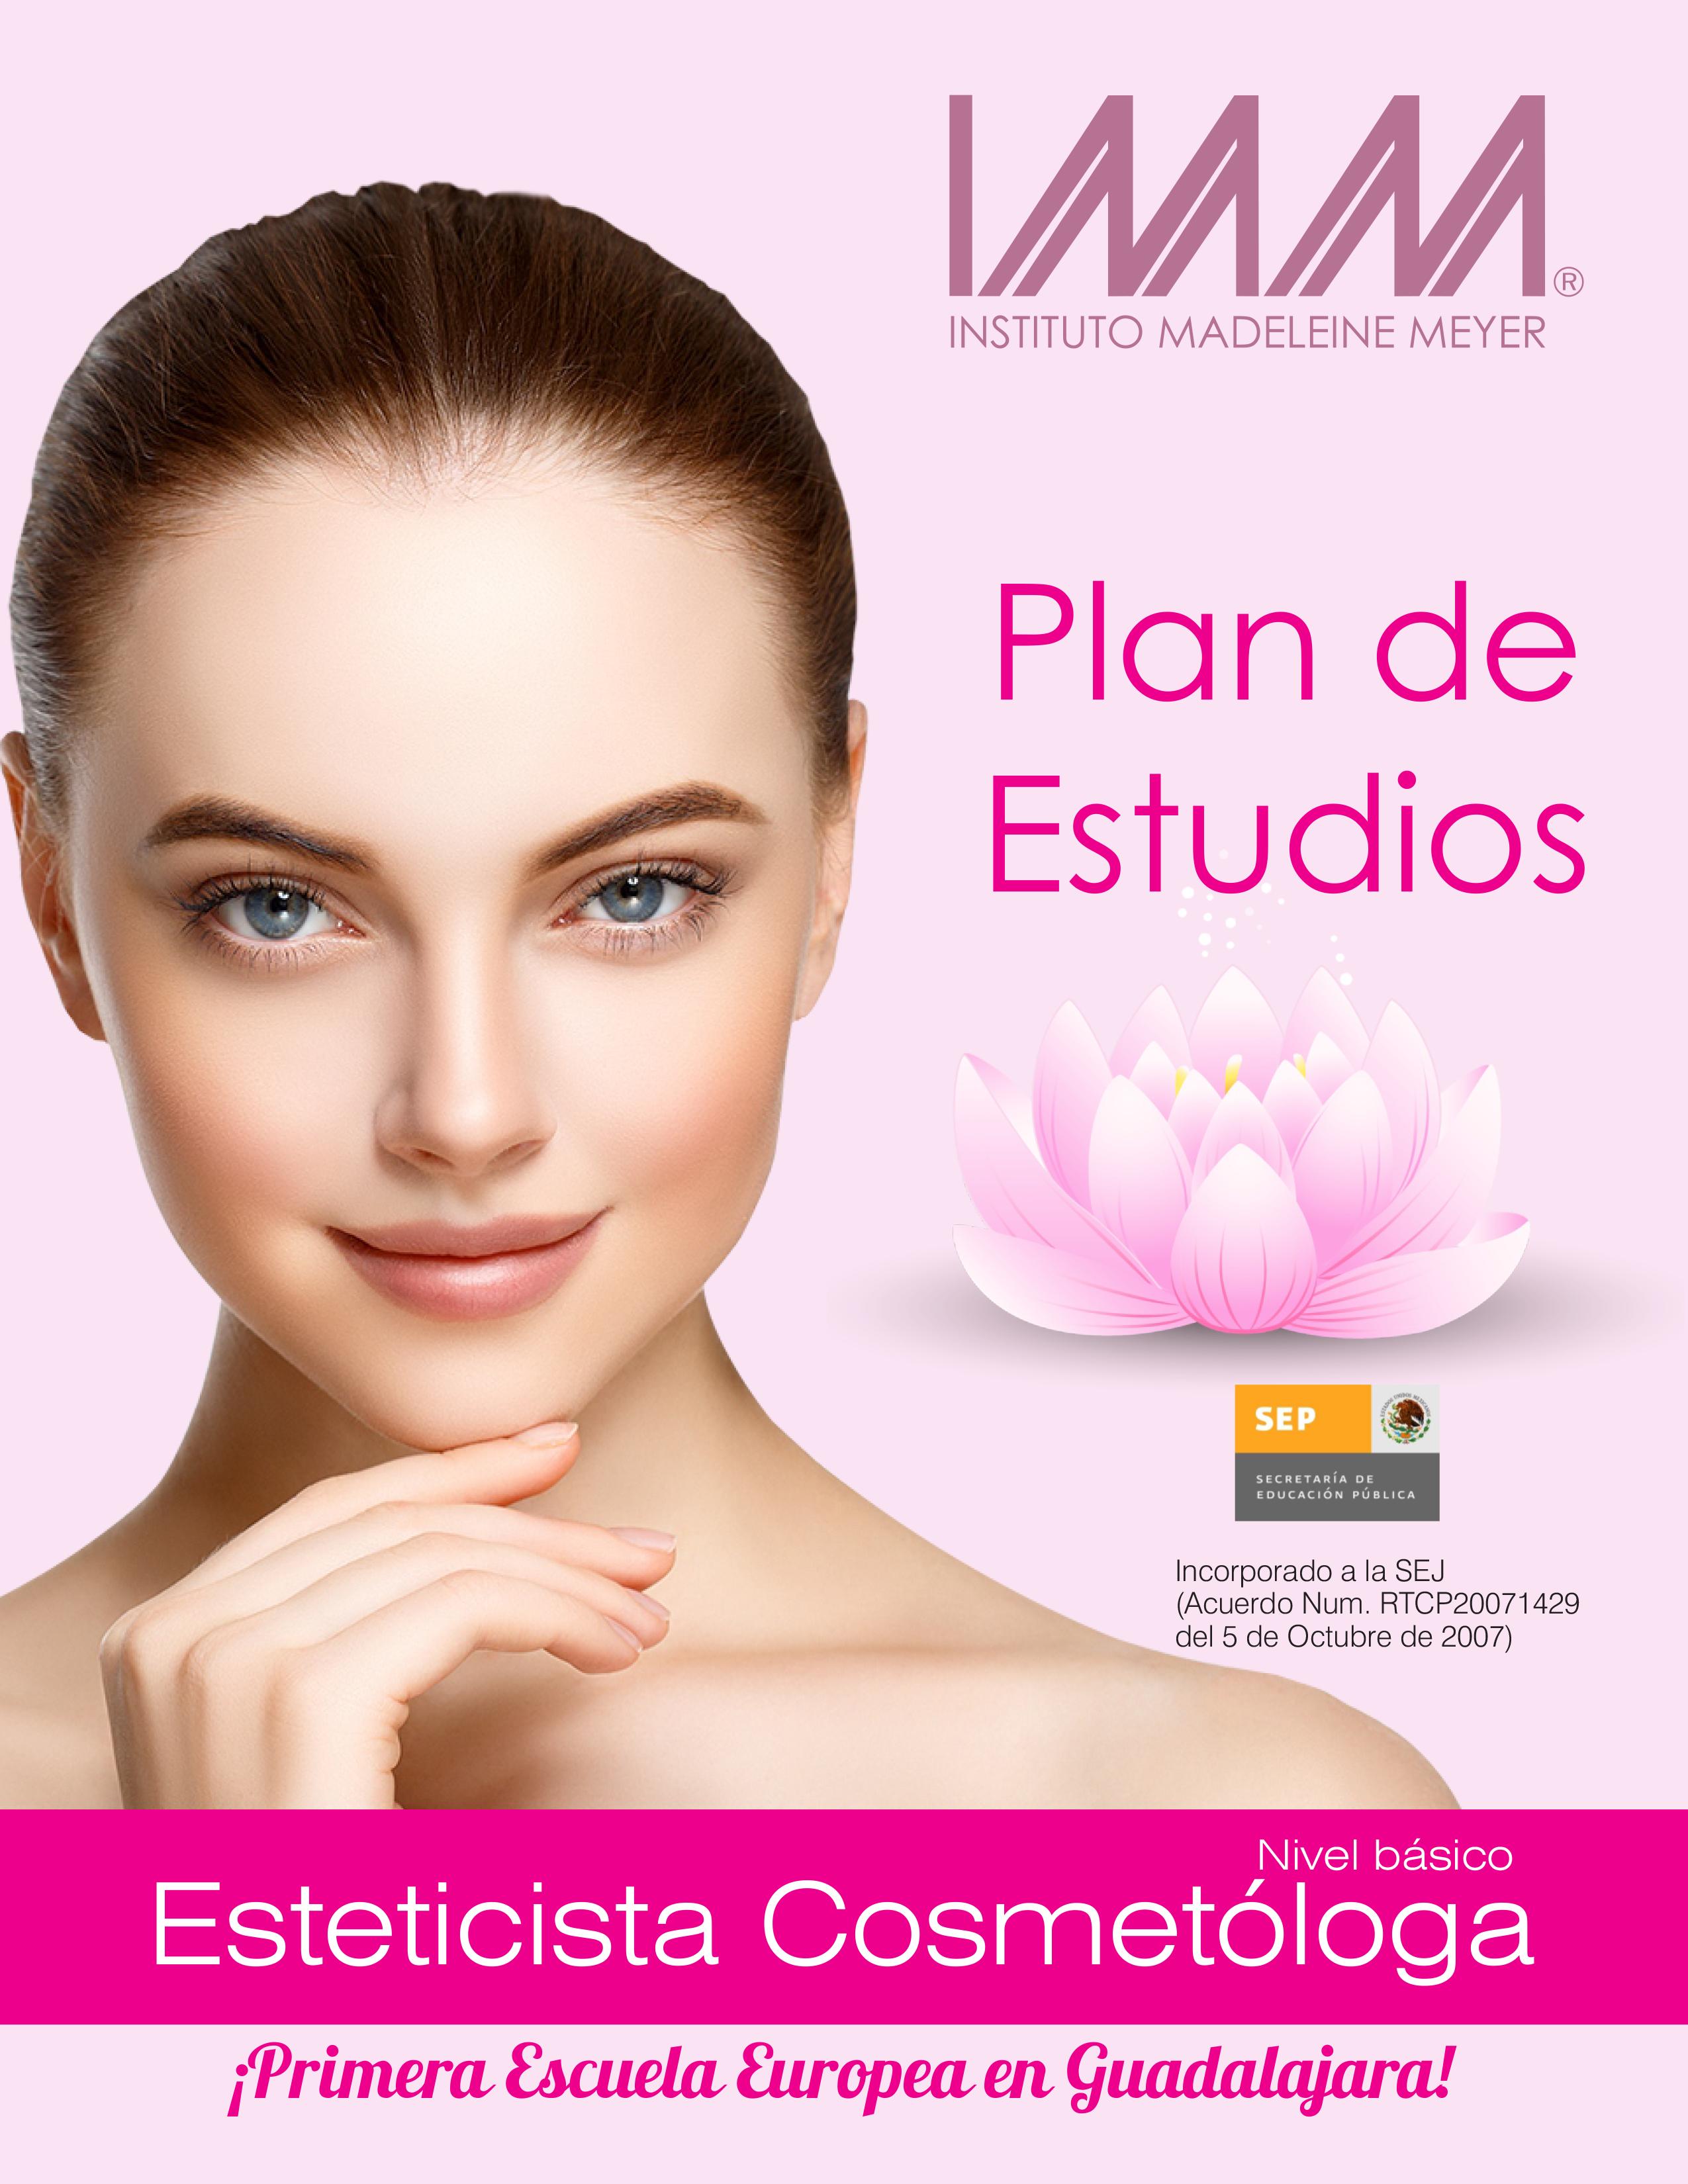 IMM-PlandeEstudios-basico2018-1